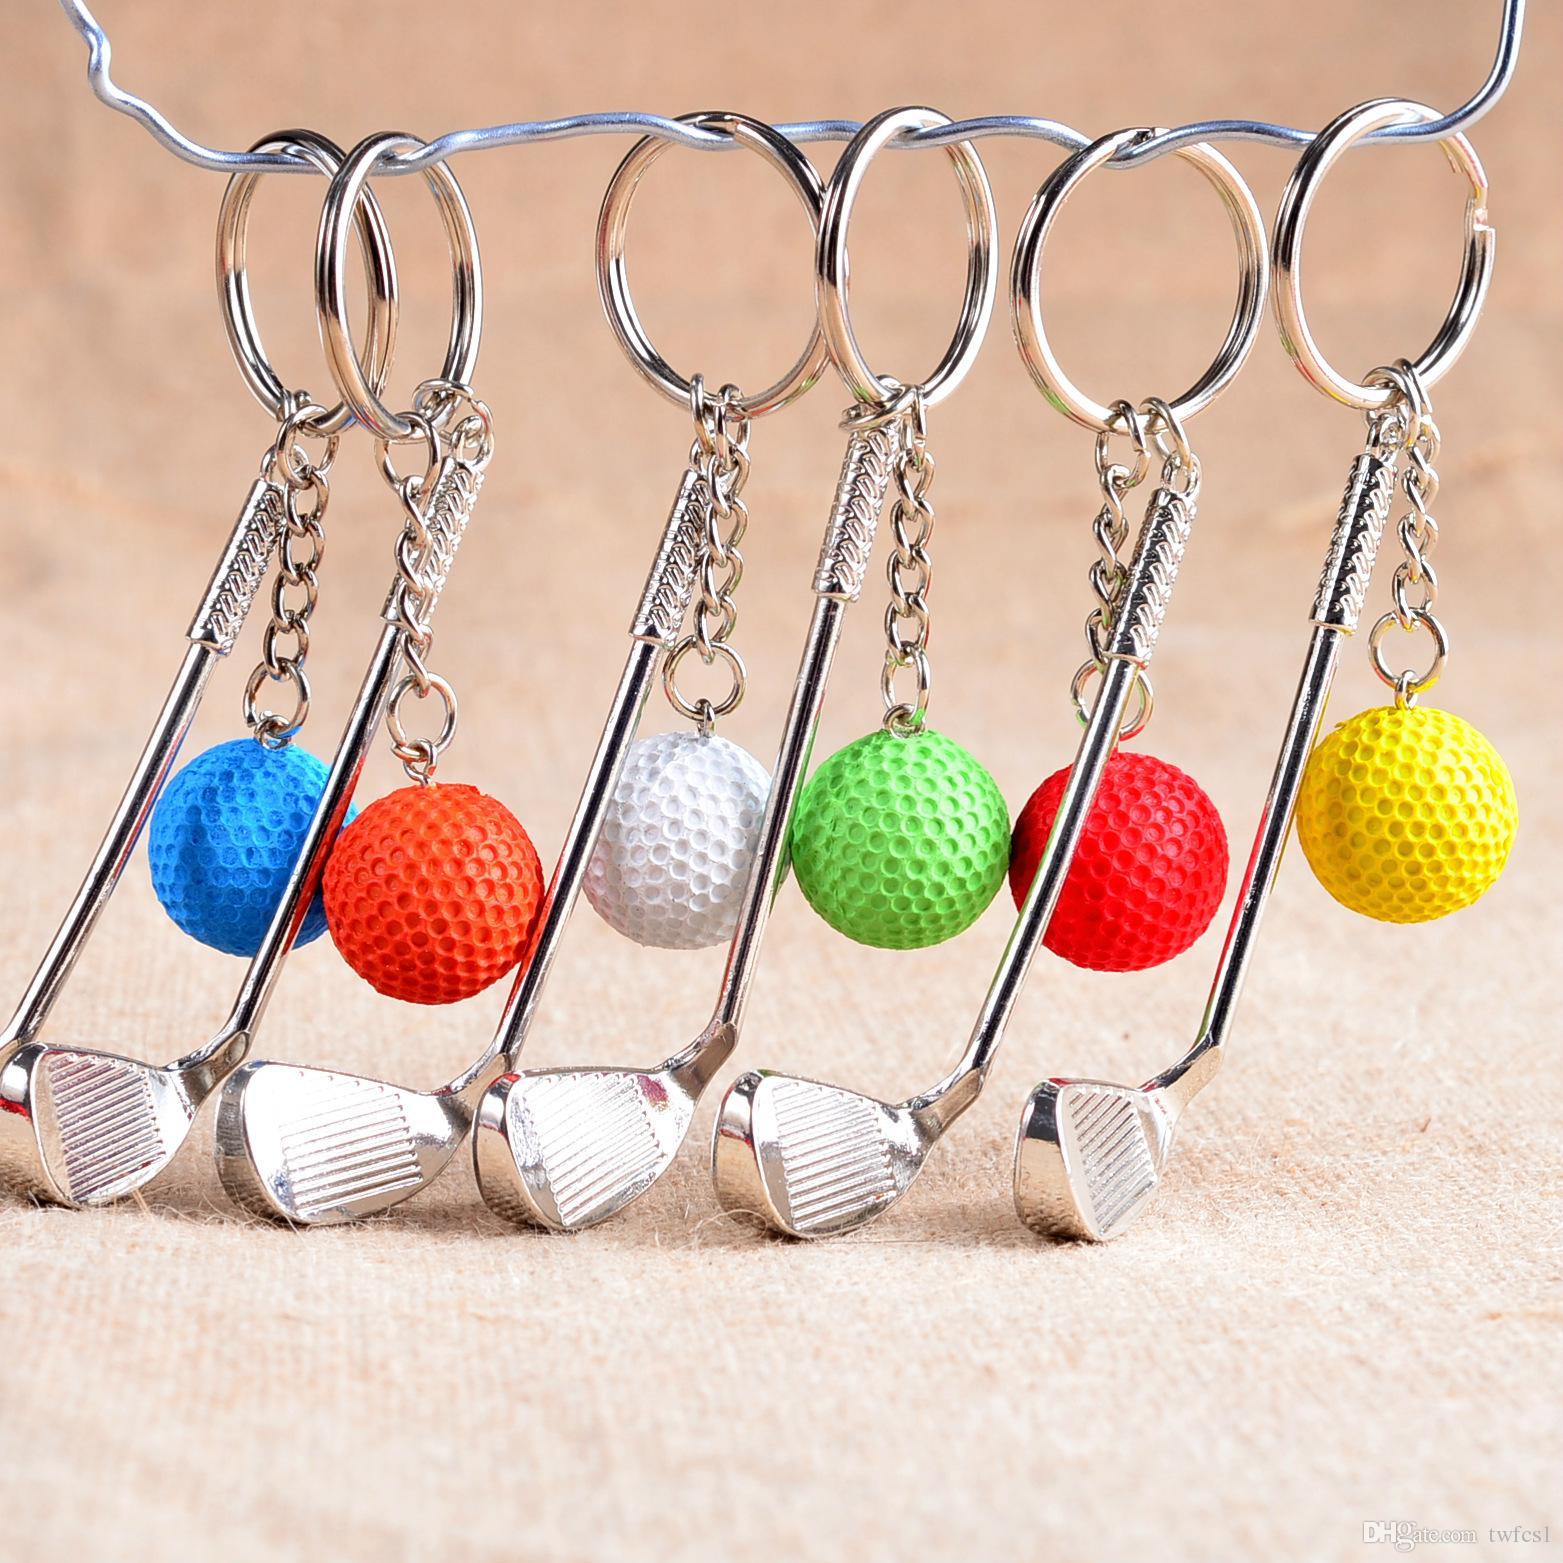 3147724c9 Compre Nova Moda 6 Cores Metallic Golf Chaveiros Anel Rei High End De Artigos  Esportivos Jogos De Lembrança De Presente De Natal De Twfcs1